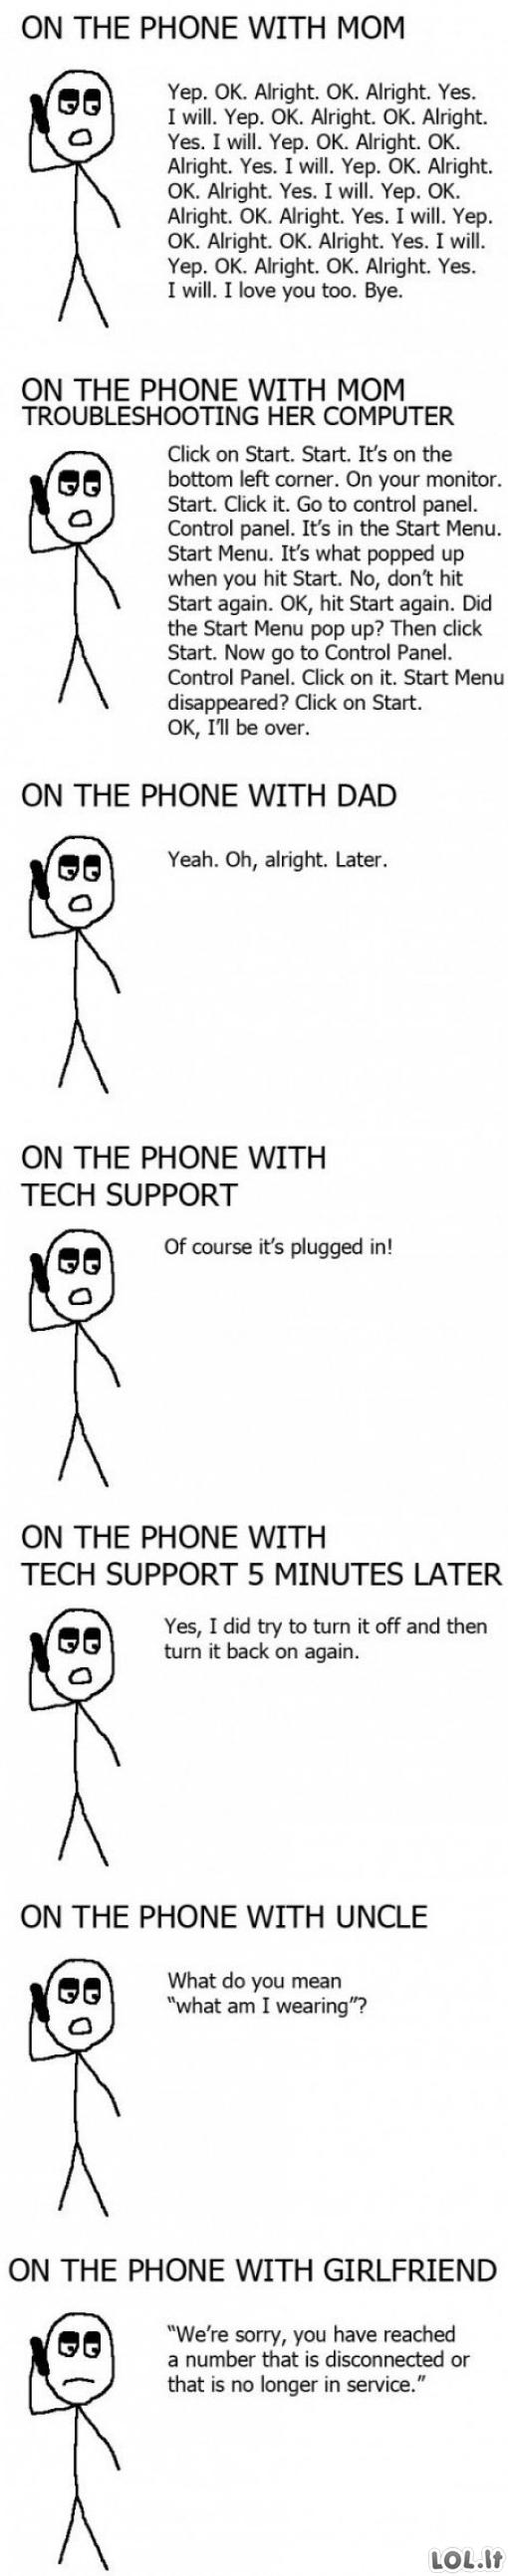 Pokalbiai telefonu